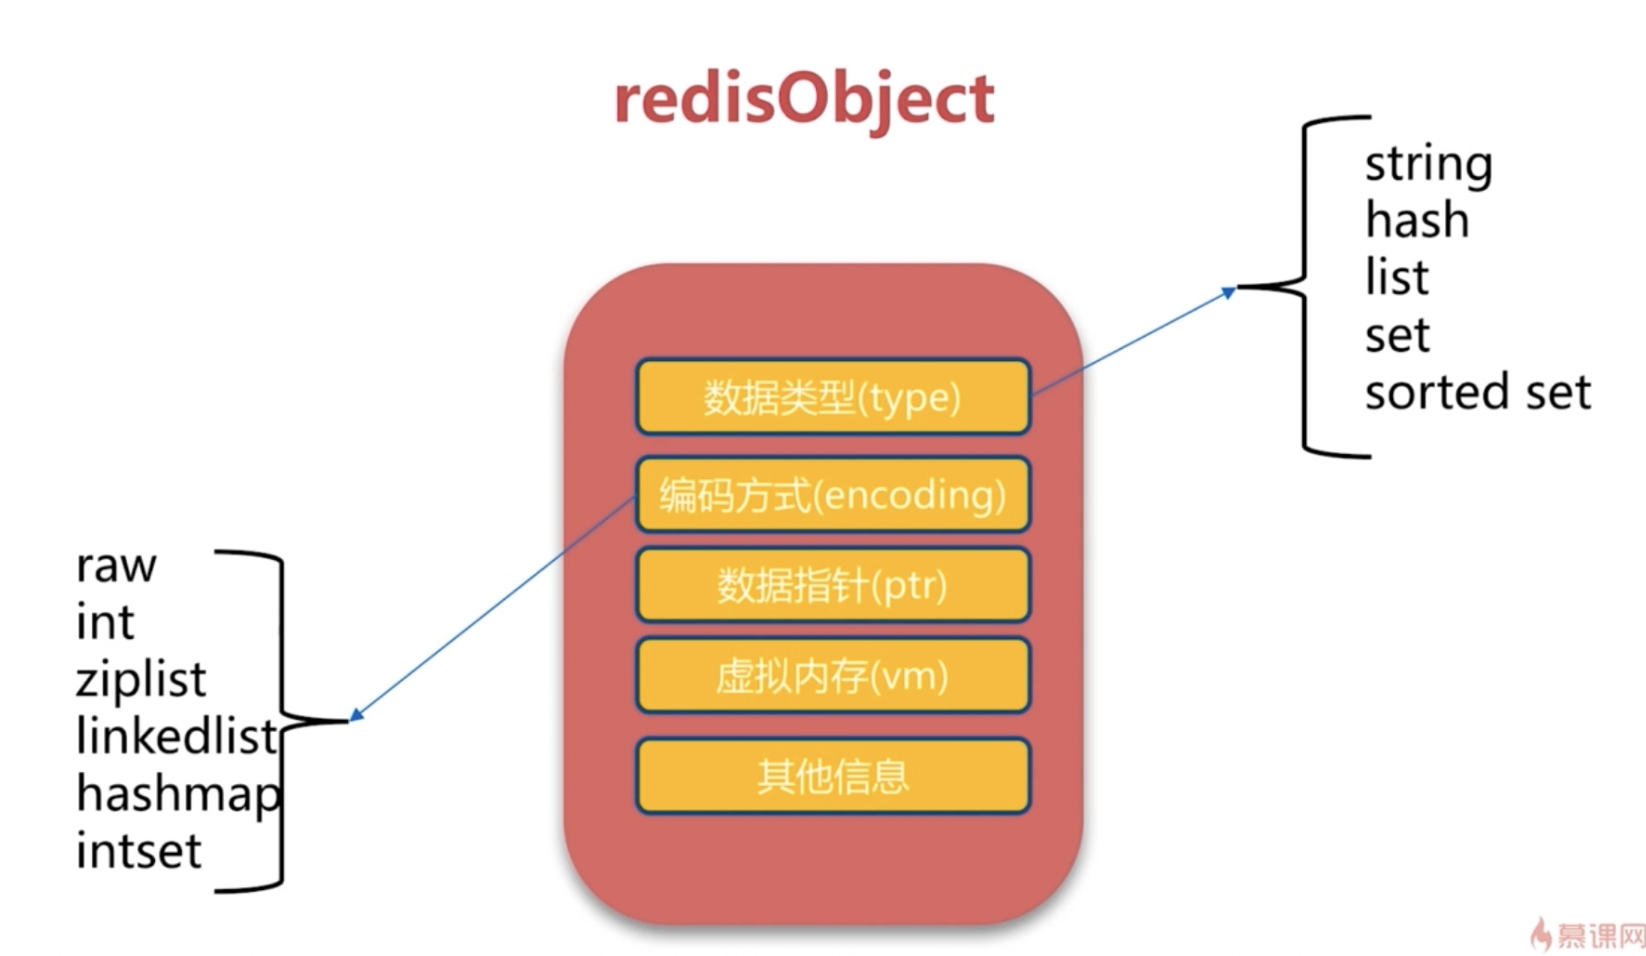 RedisObject对象的构成